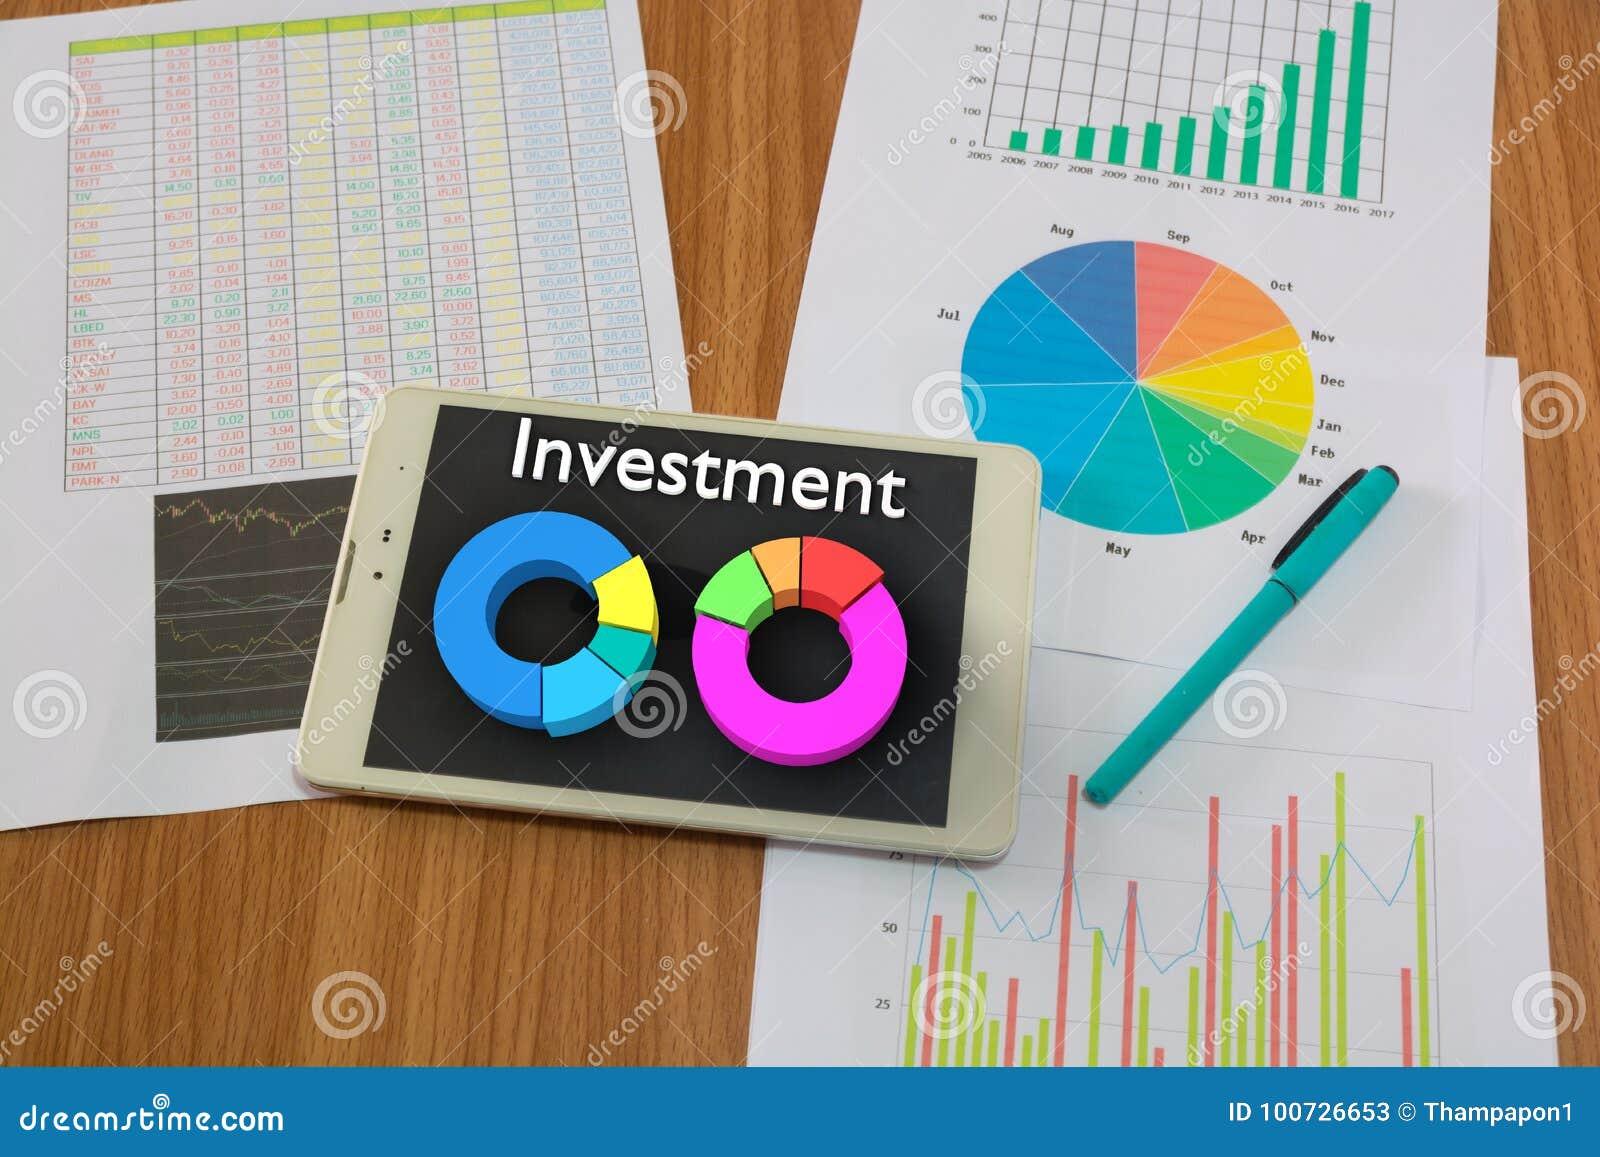 wireless tablet pc wooden desk stock market report bar chart pie diagram pen as account financial money investment 100726653 wireless tablet pc on wooden desk with stock market report stock